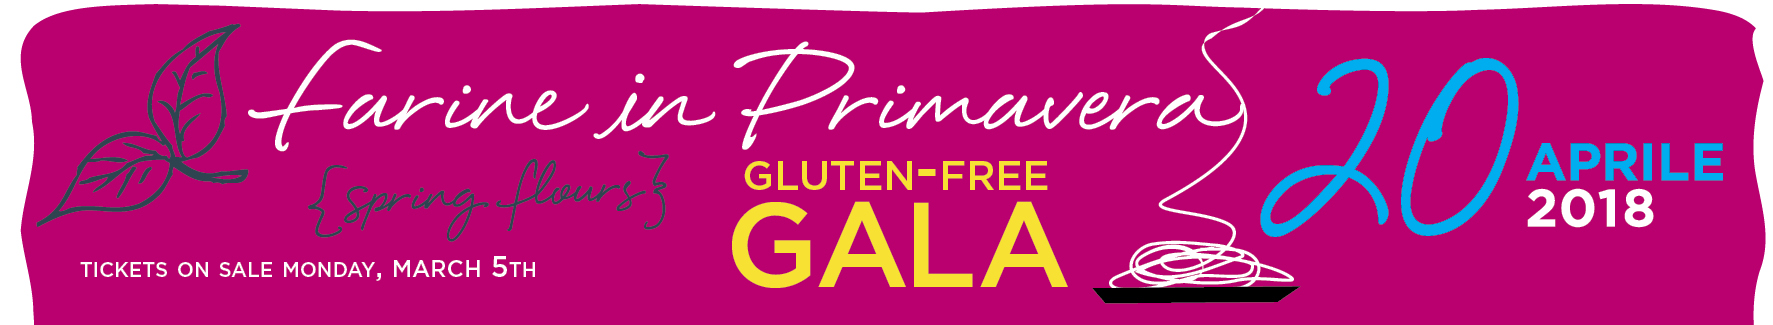 Spring Flours Gluten-Free Gala 2018